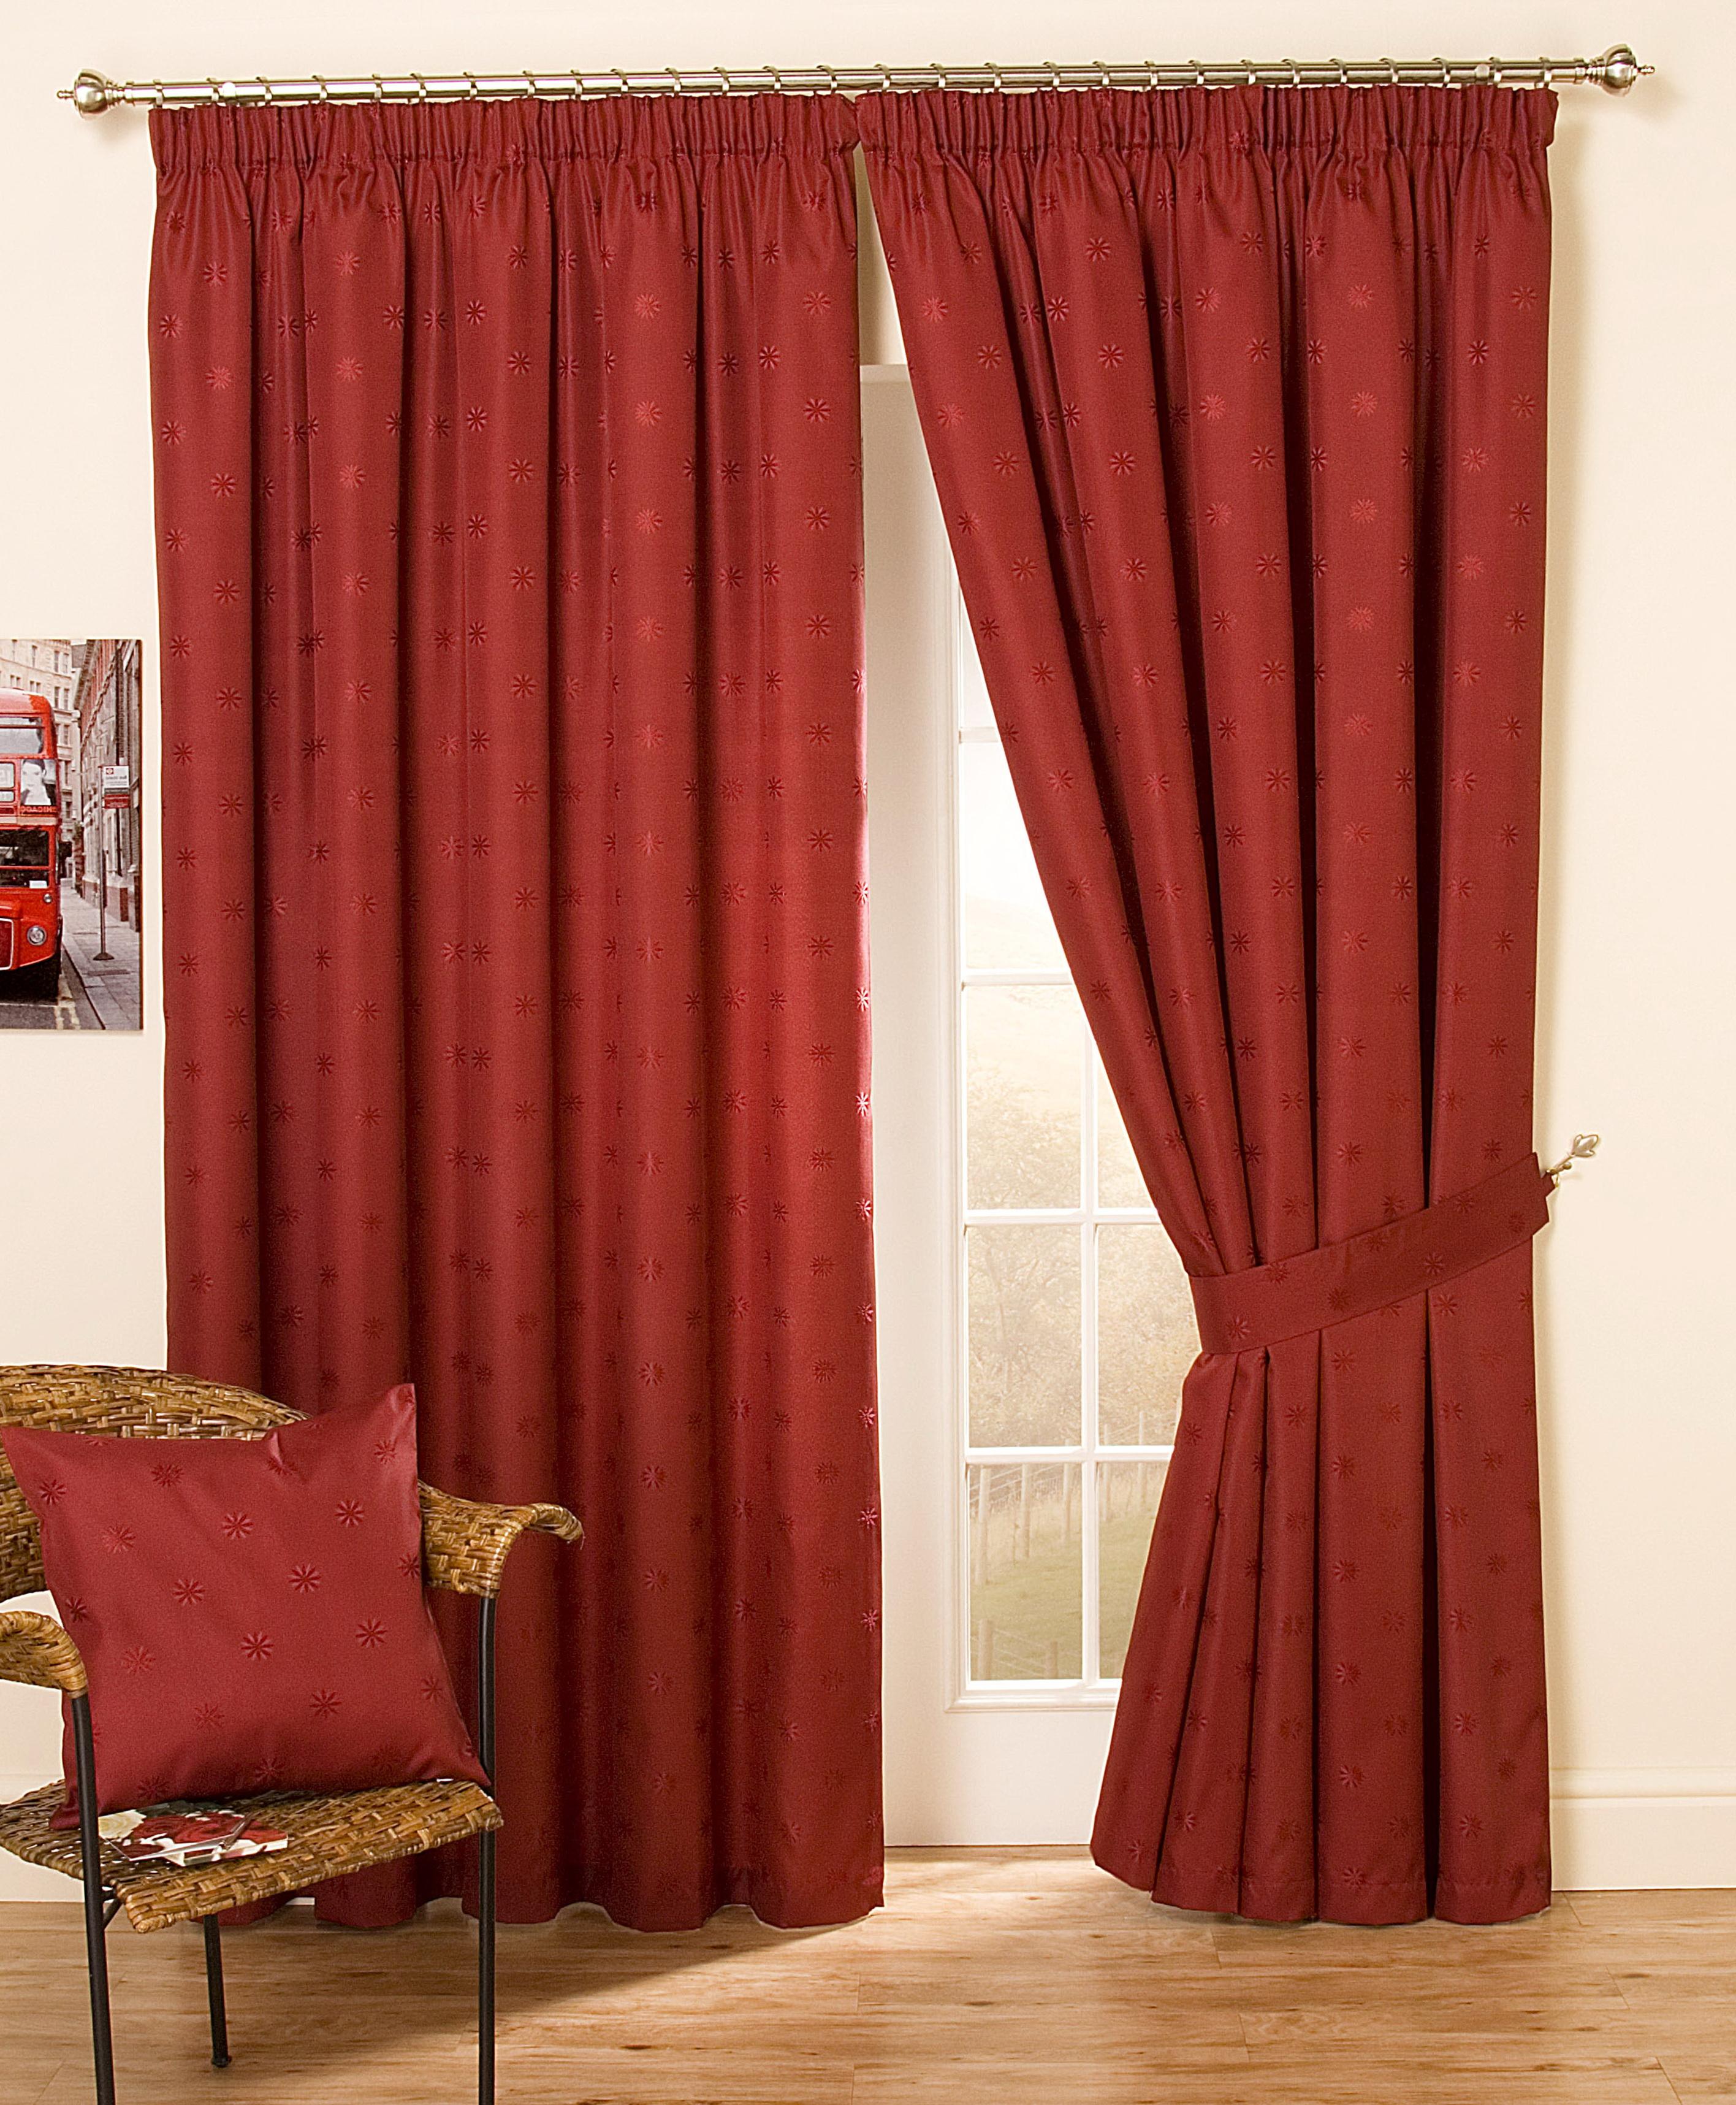 Curtains For Patio Doors Uk Home Design Ideas